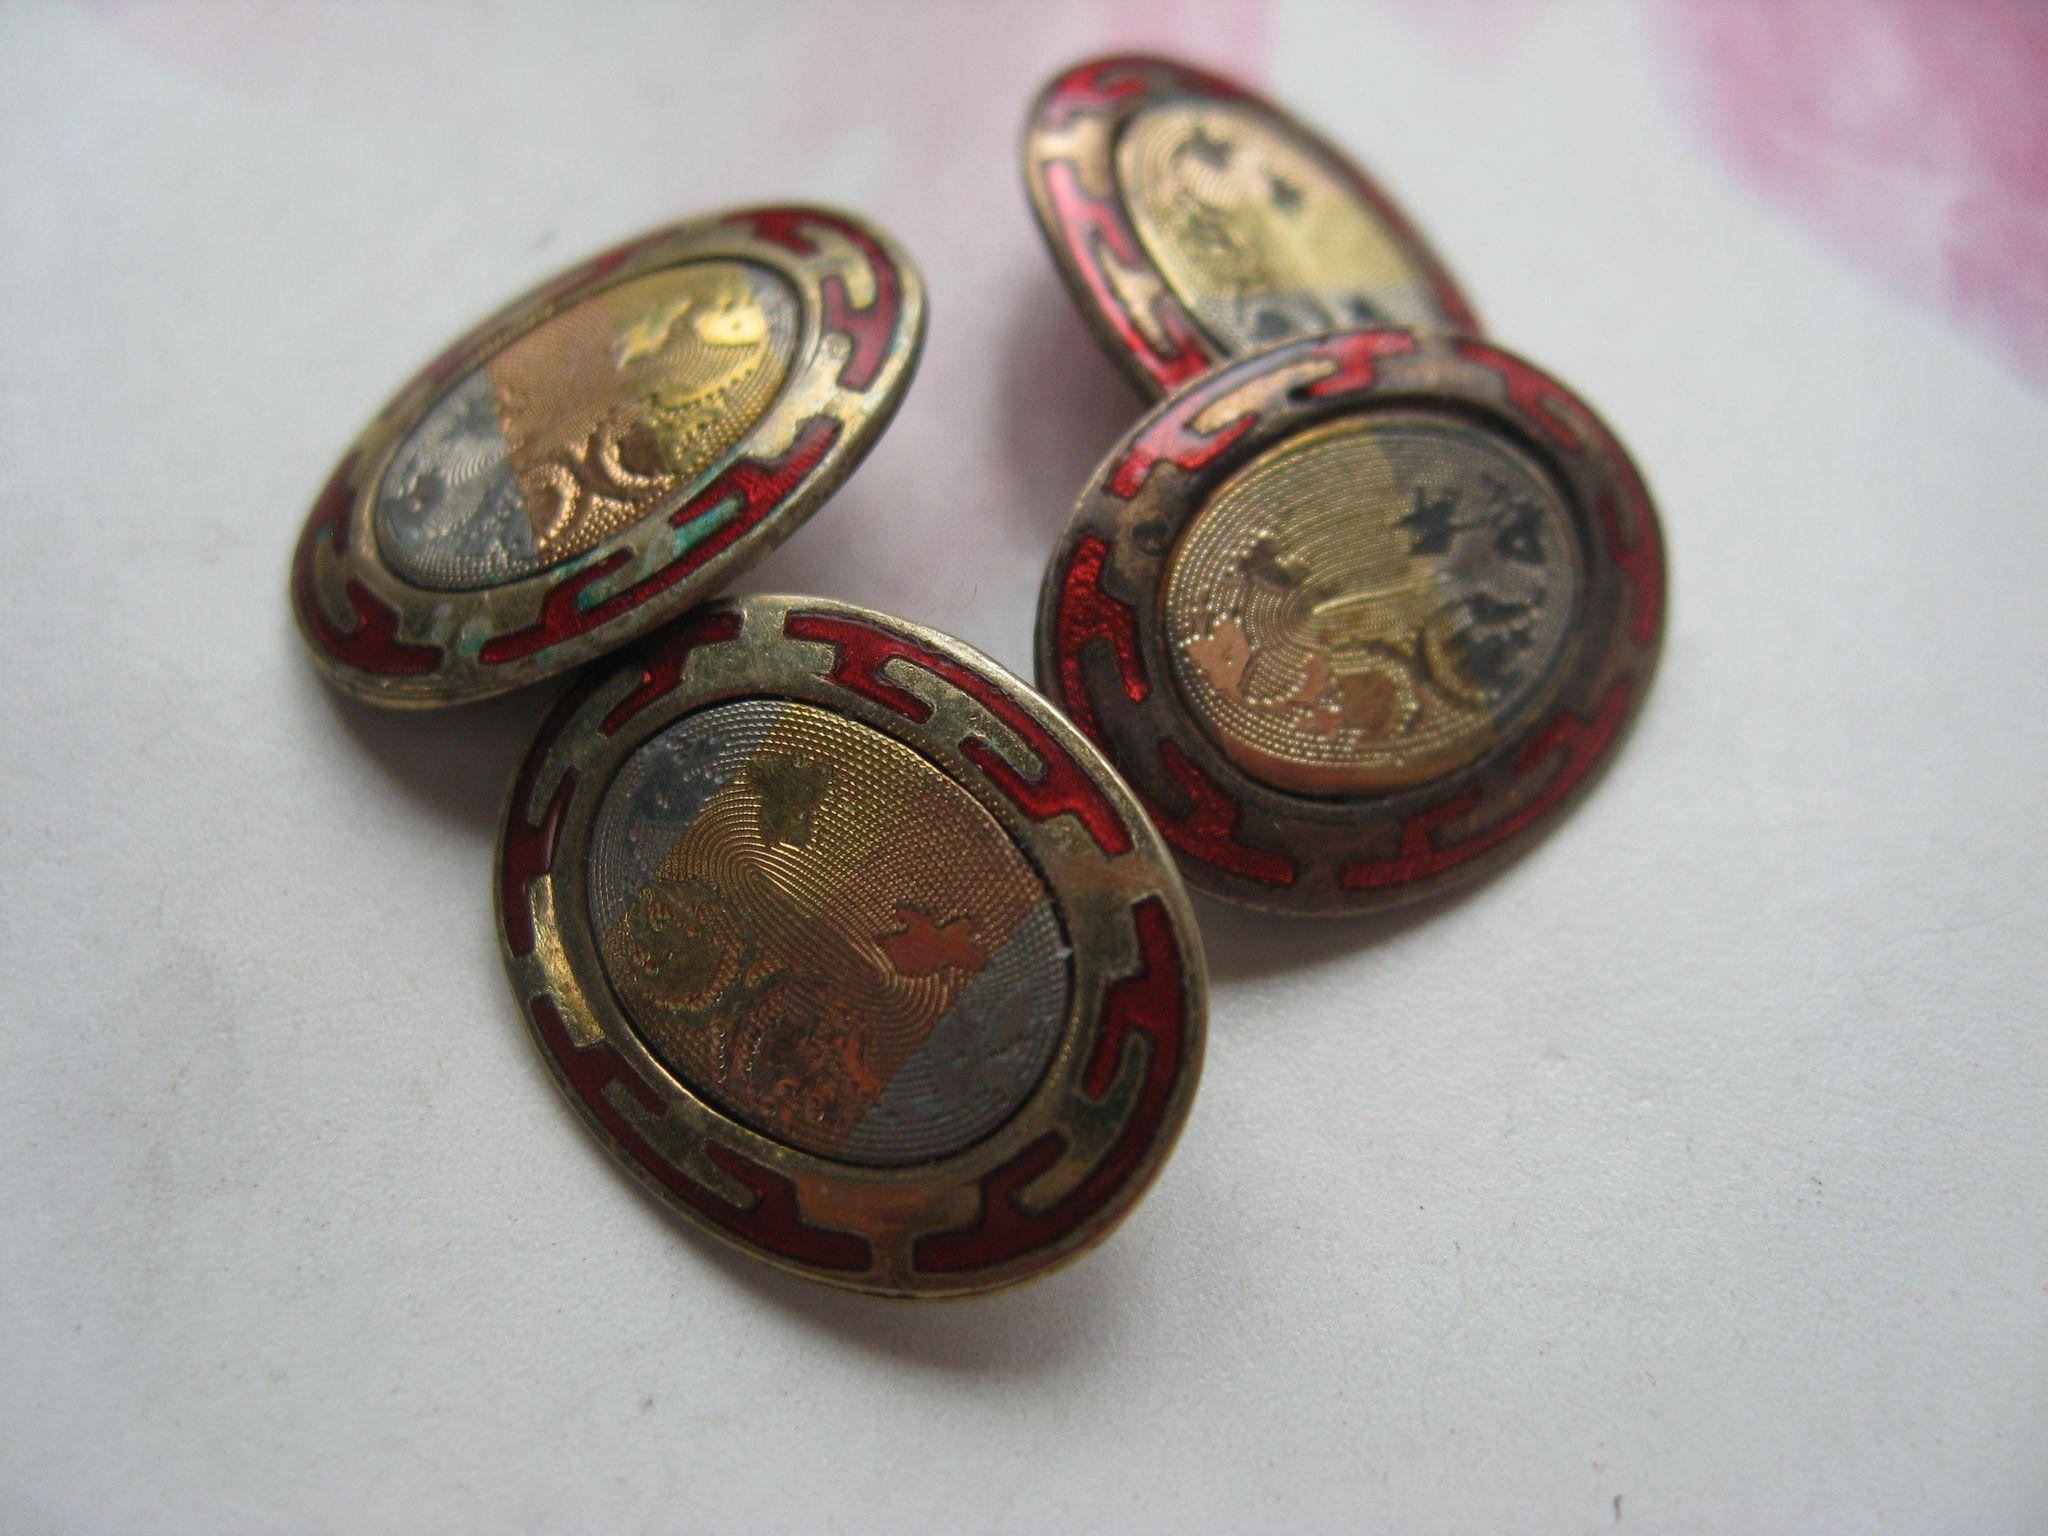 Vintage Enameled Deco Cufflinks 1920s Cuff Links